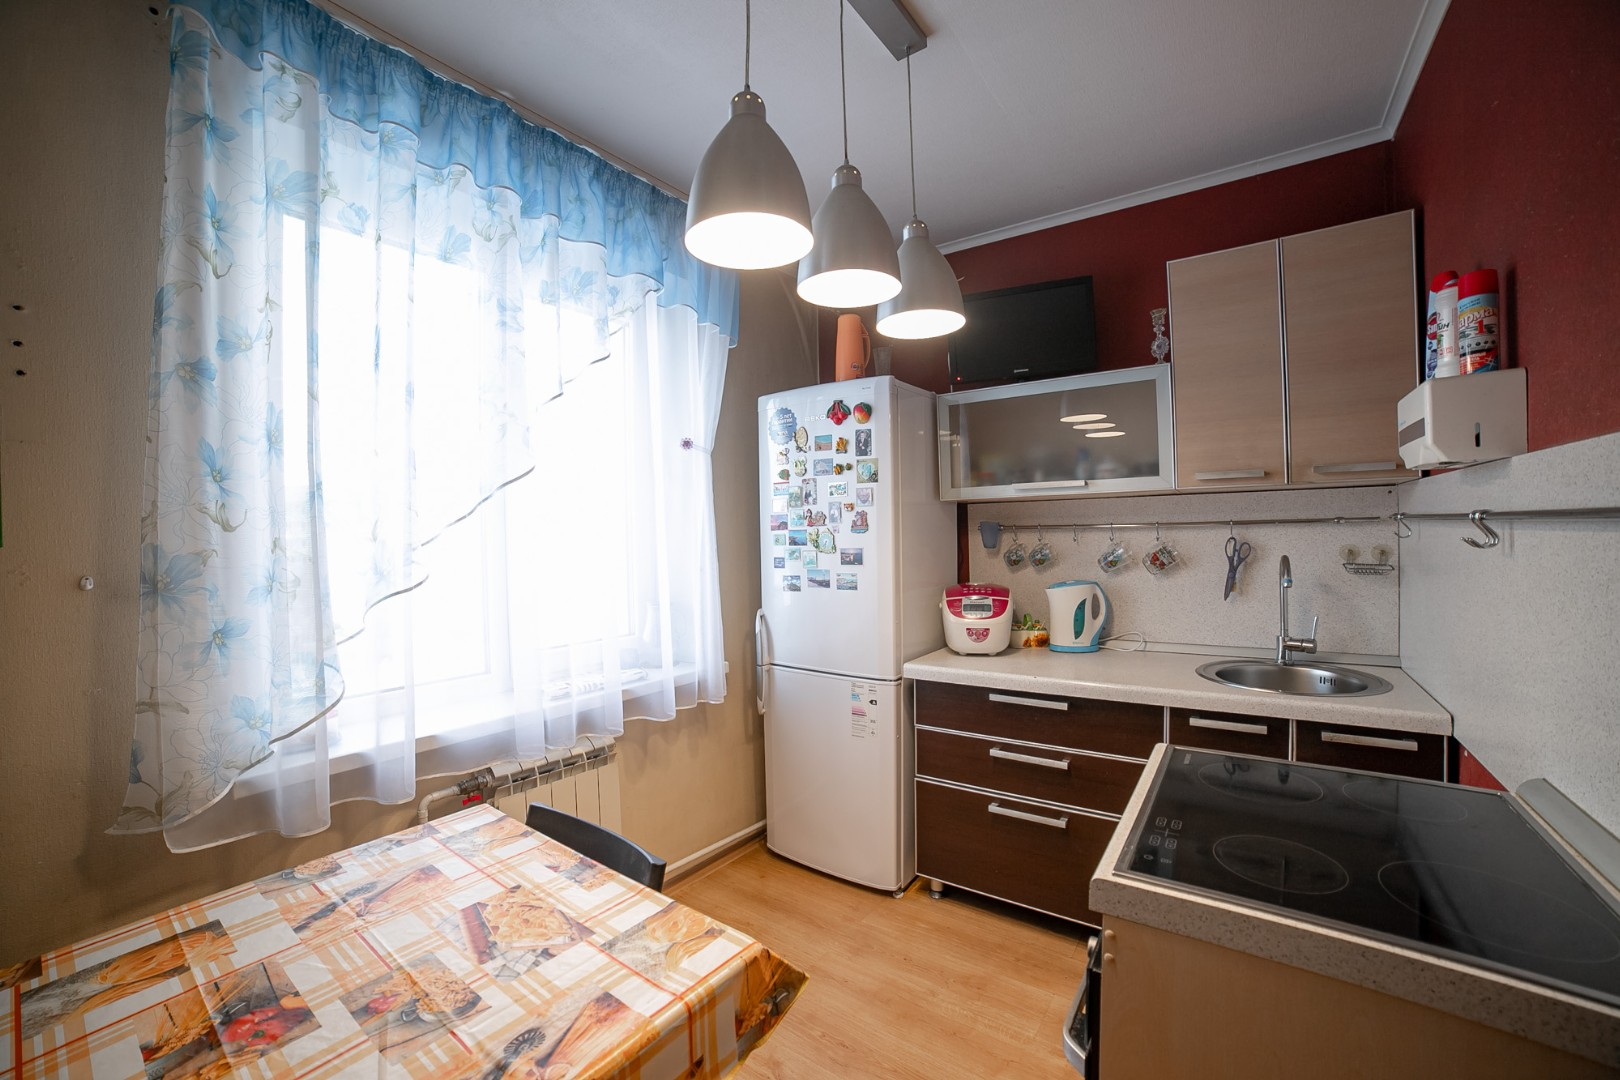 Россия, Томск, улица Клюева, 26